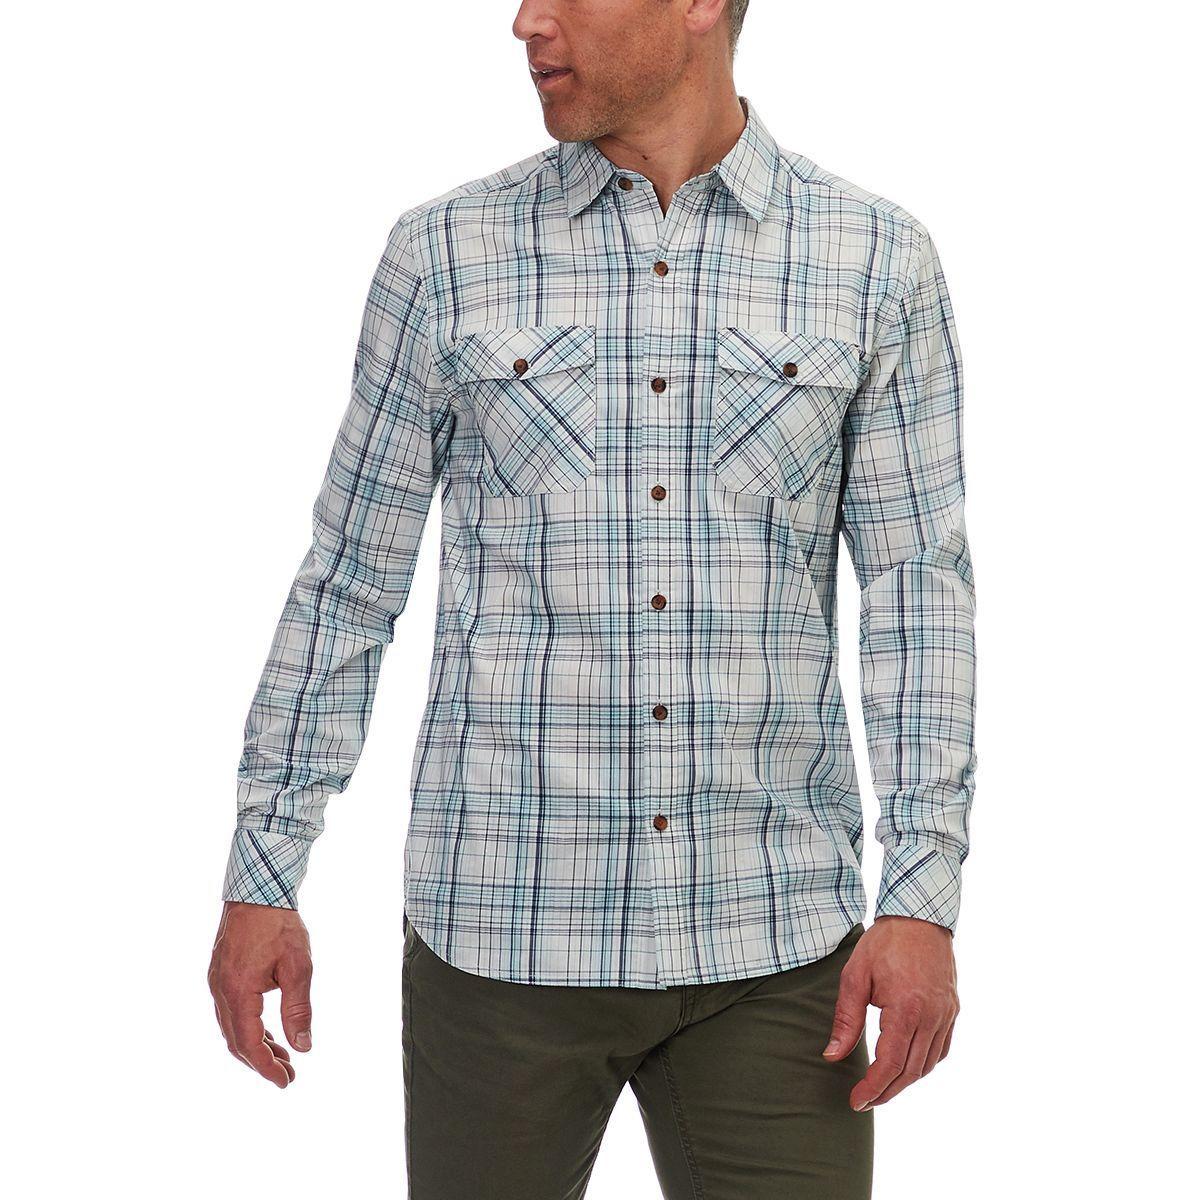 Basin And Range Kings Peak Plaid Long Sleeve Shirt Mens